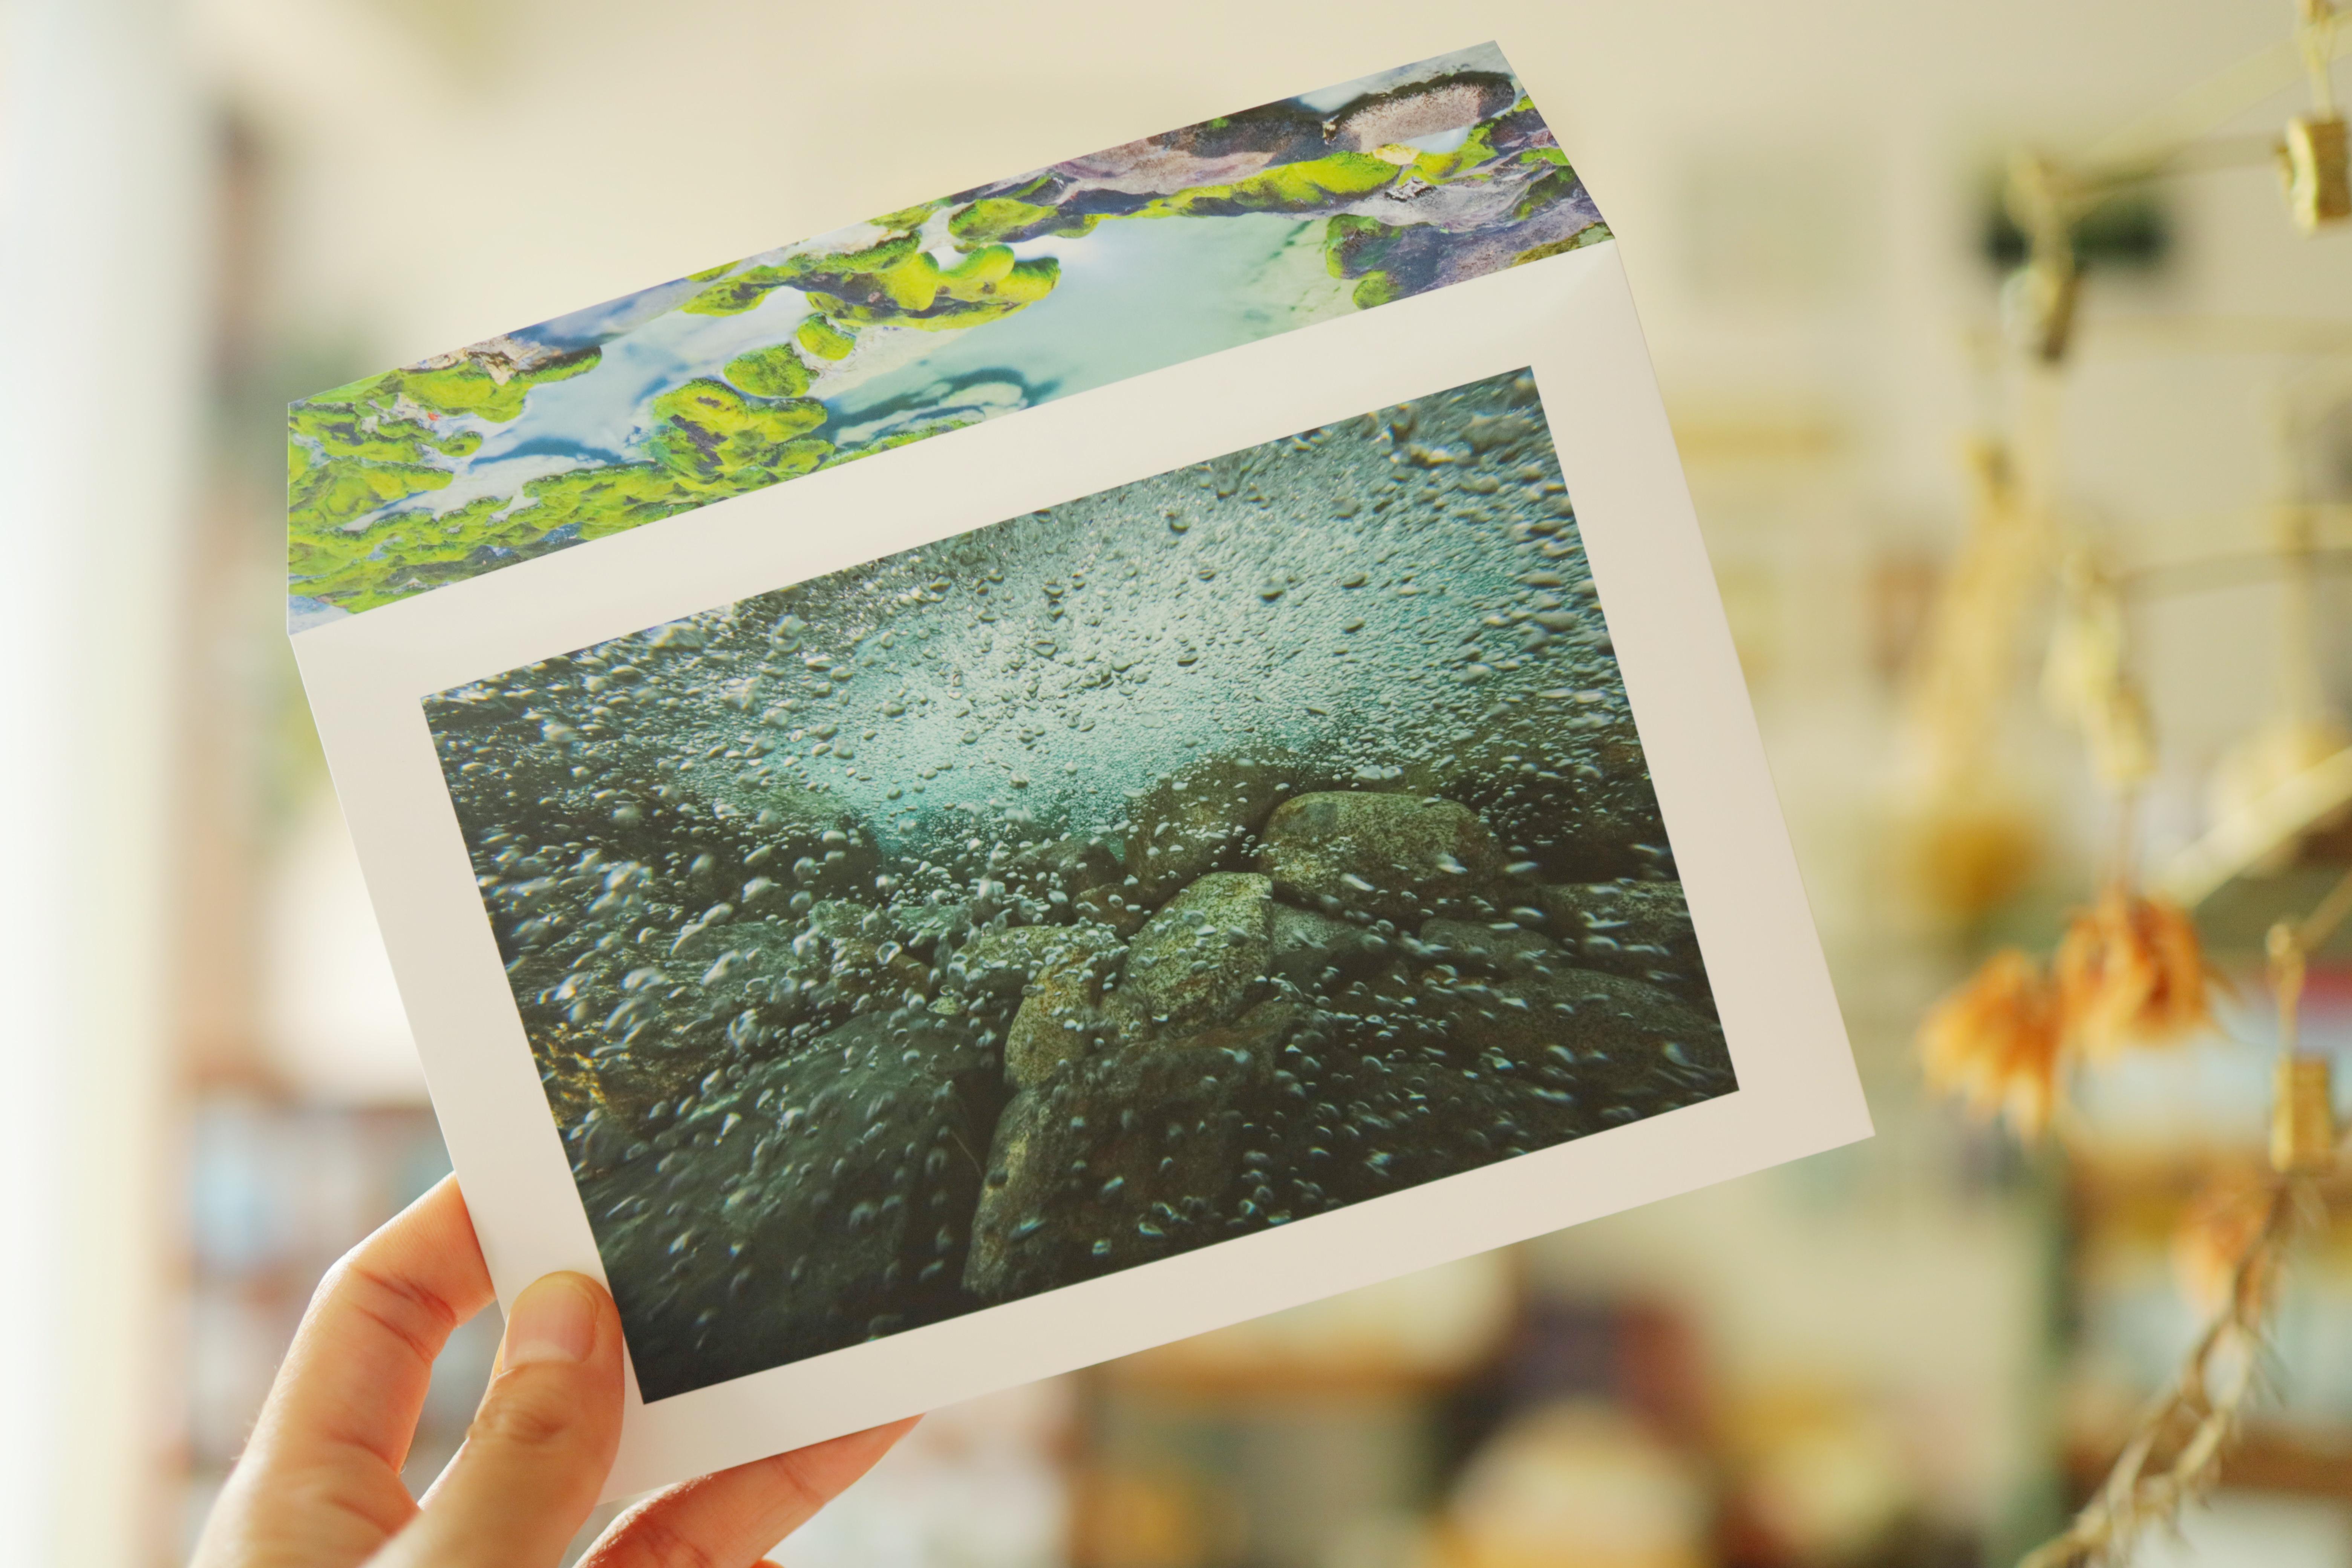 AtelierPiccoloにて「GOTOAKI 地球への手紙」を制作、販売